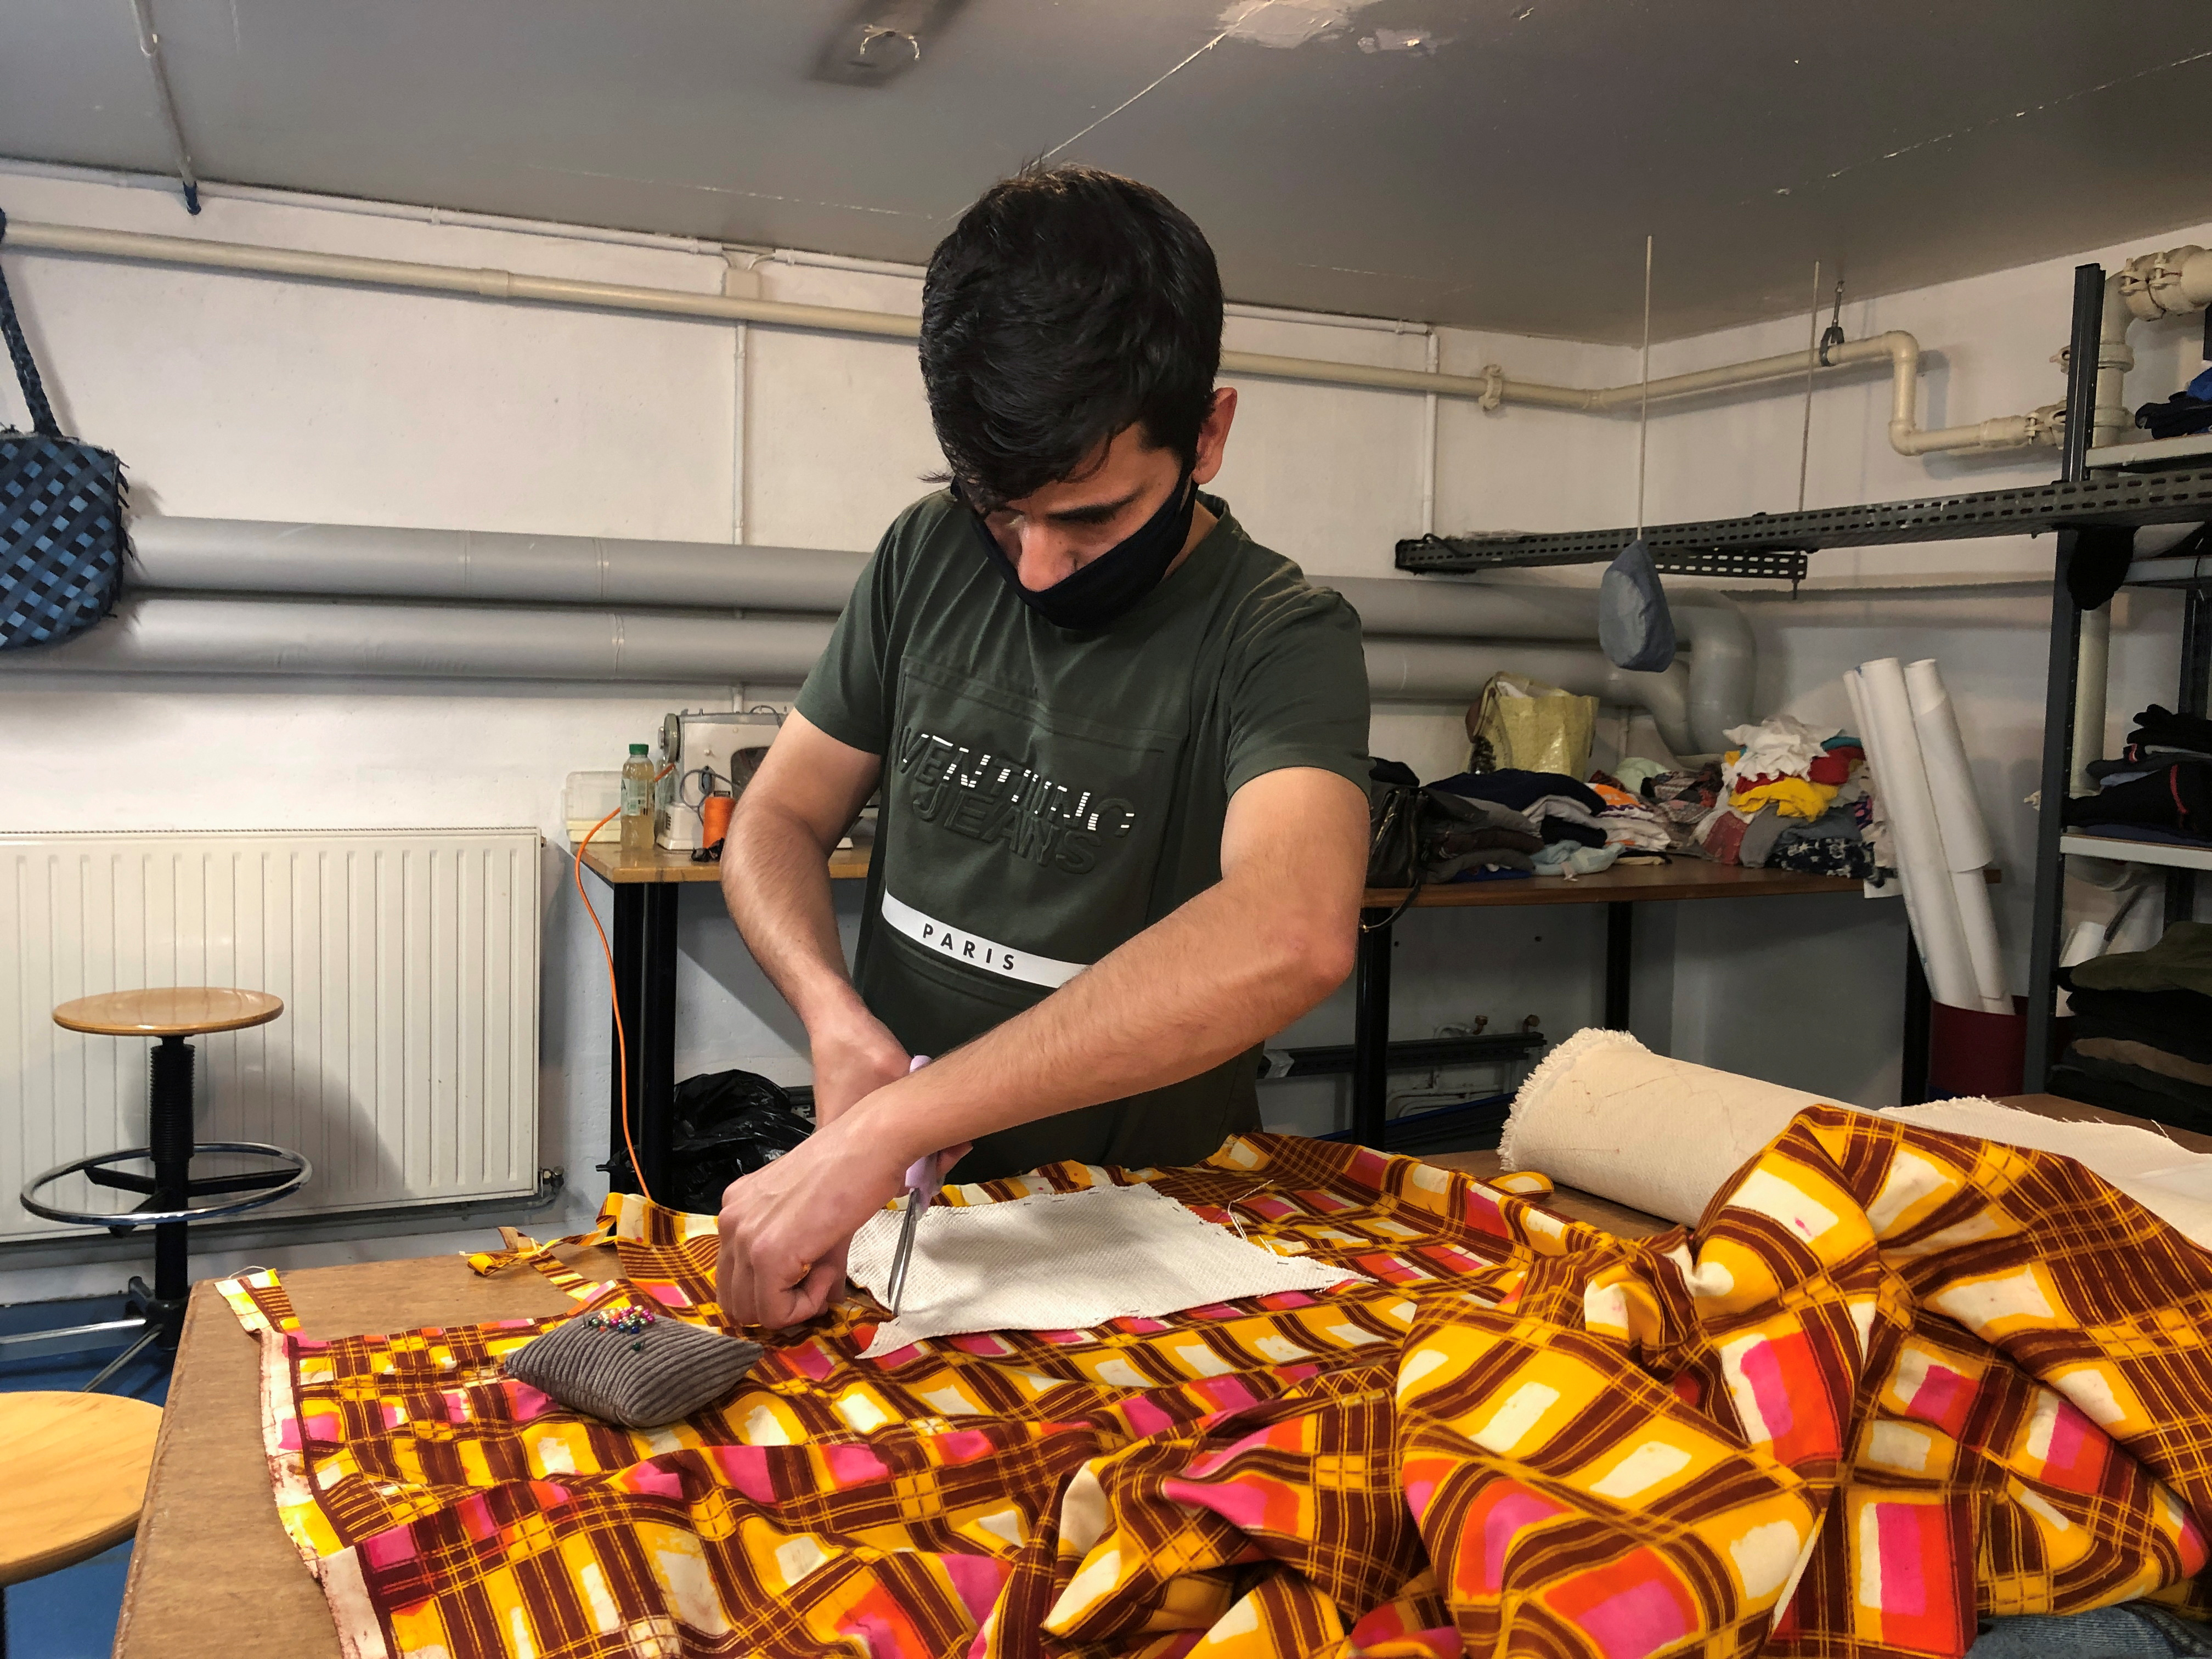 Afghan asylum seeker Haroon Sherzad cuts fabrics at a workshop in Antony, near Paris, France, June 11, 2021. Picture taken June 11, 2021. REUTERS/Michaela Cabrera